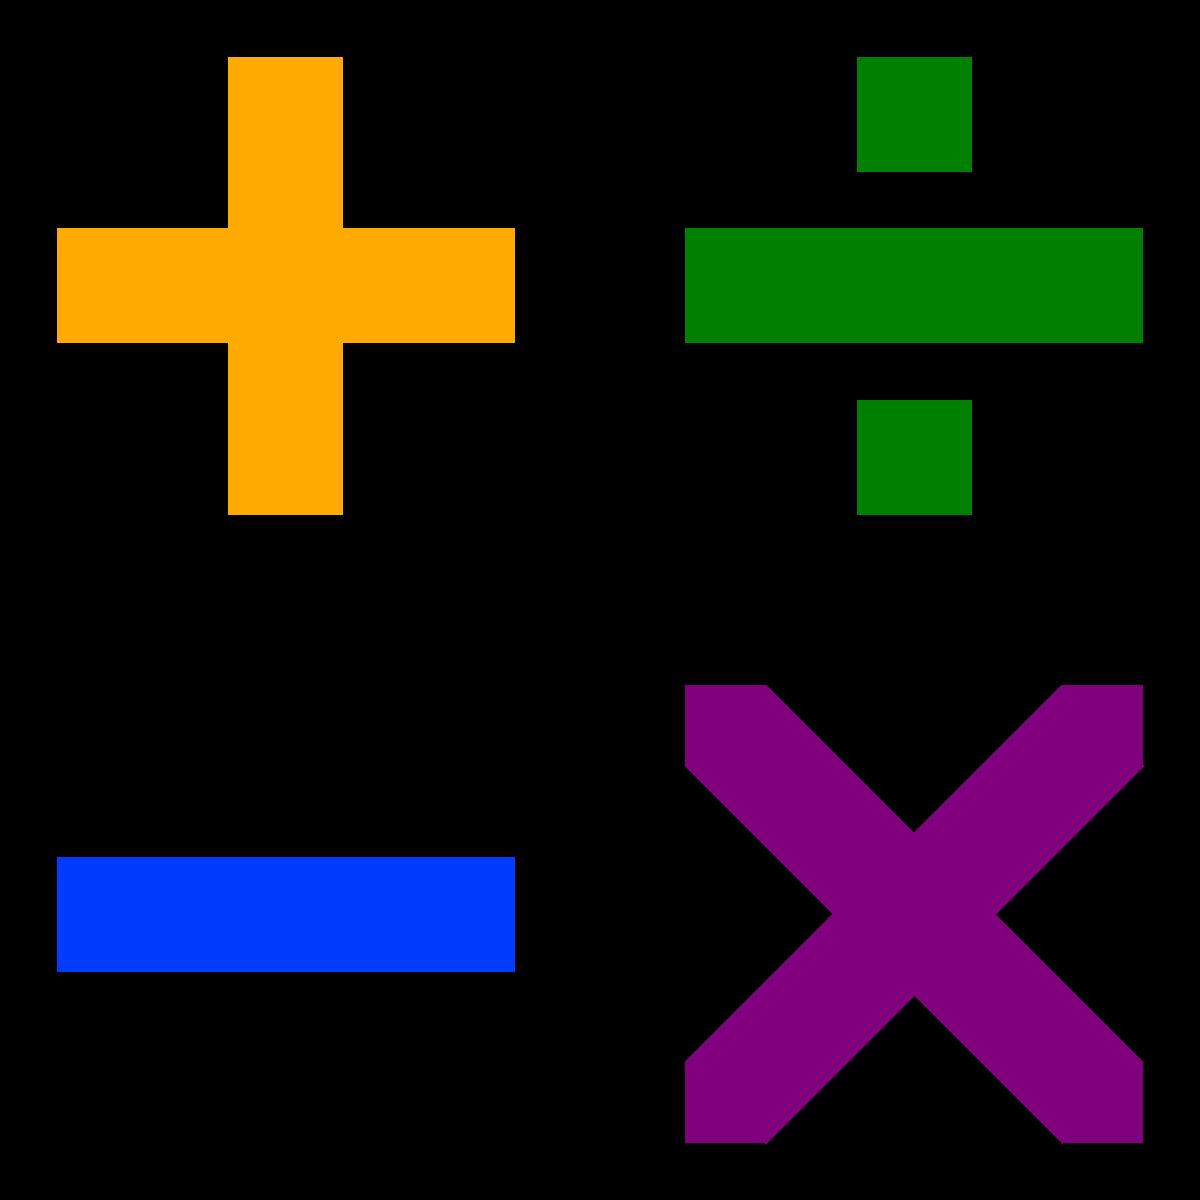 Math Symbolism